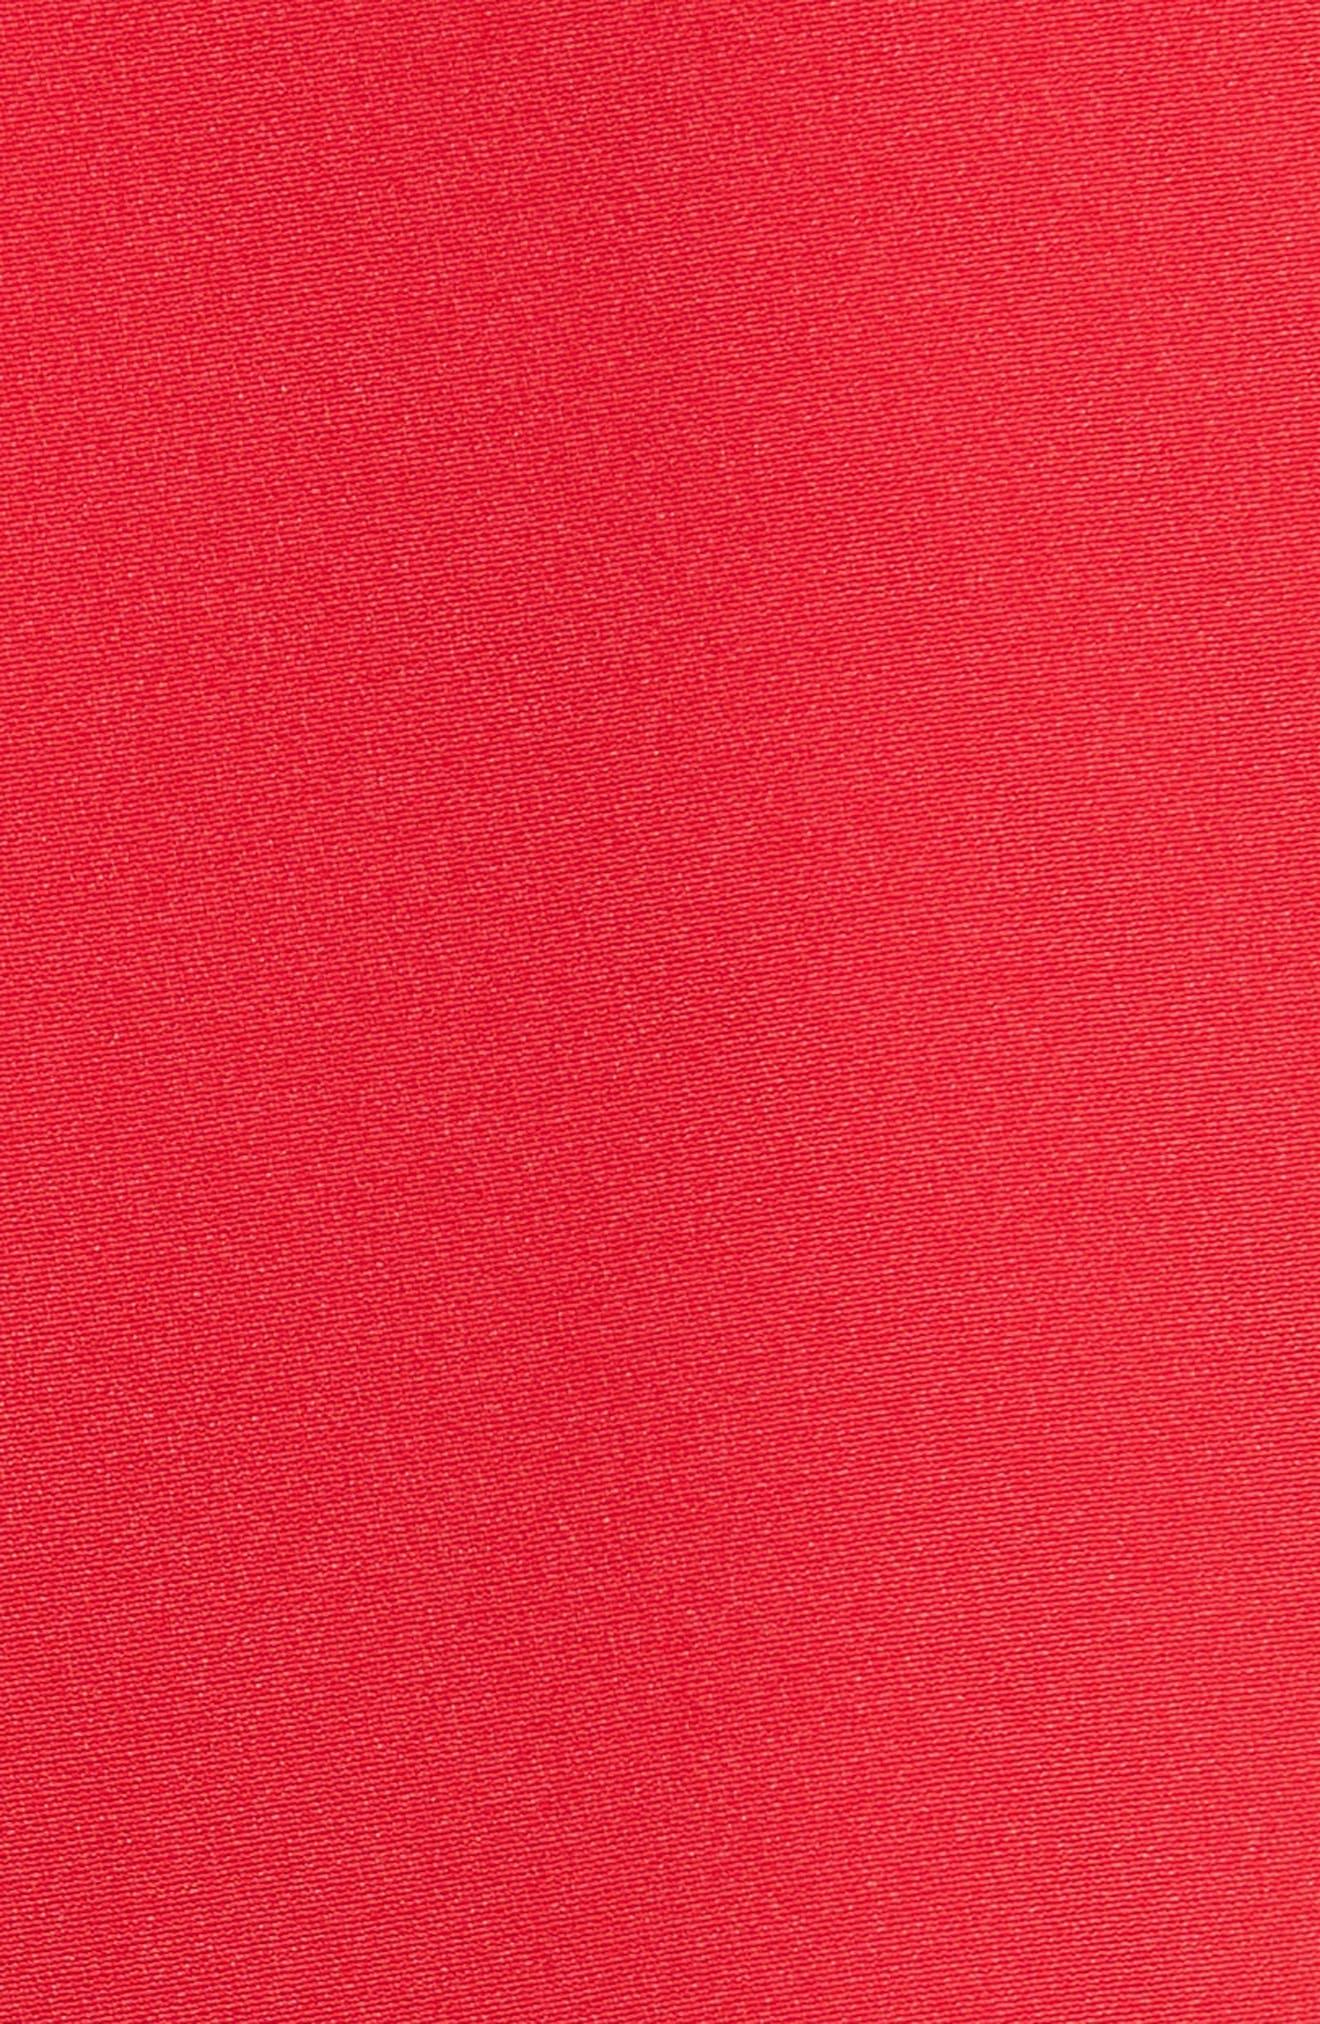 Silk Satin Crop Tank,                             Alternate thumbnail 5, color,                             600